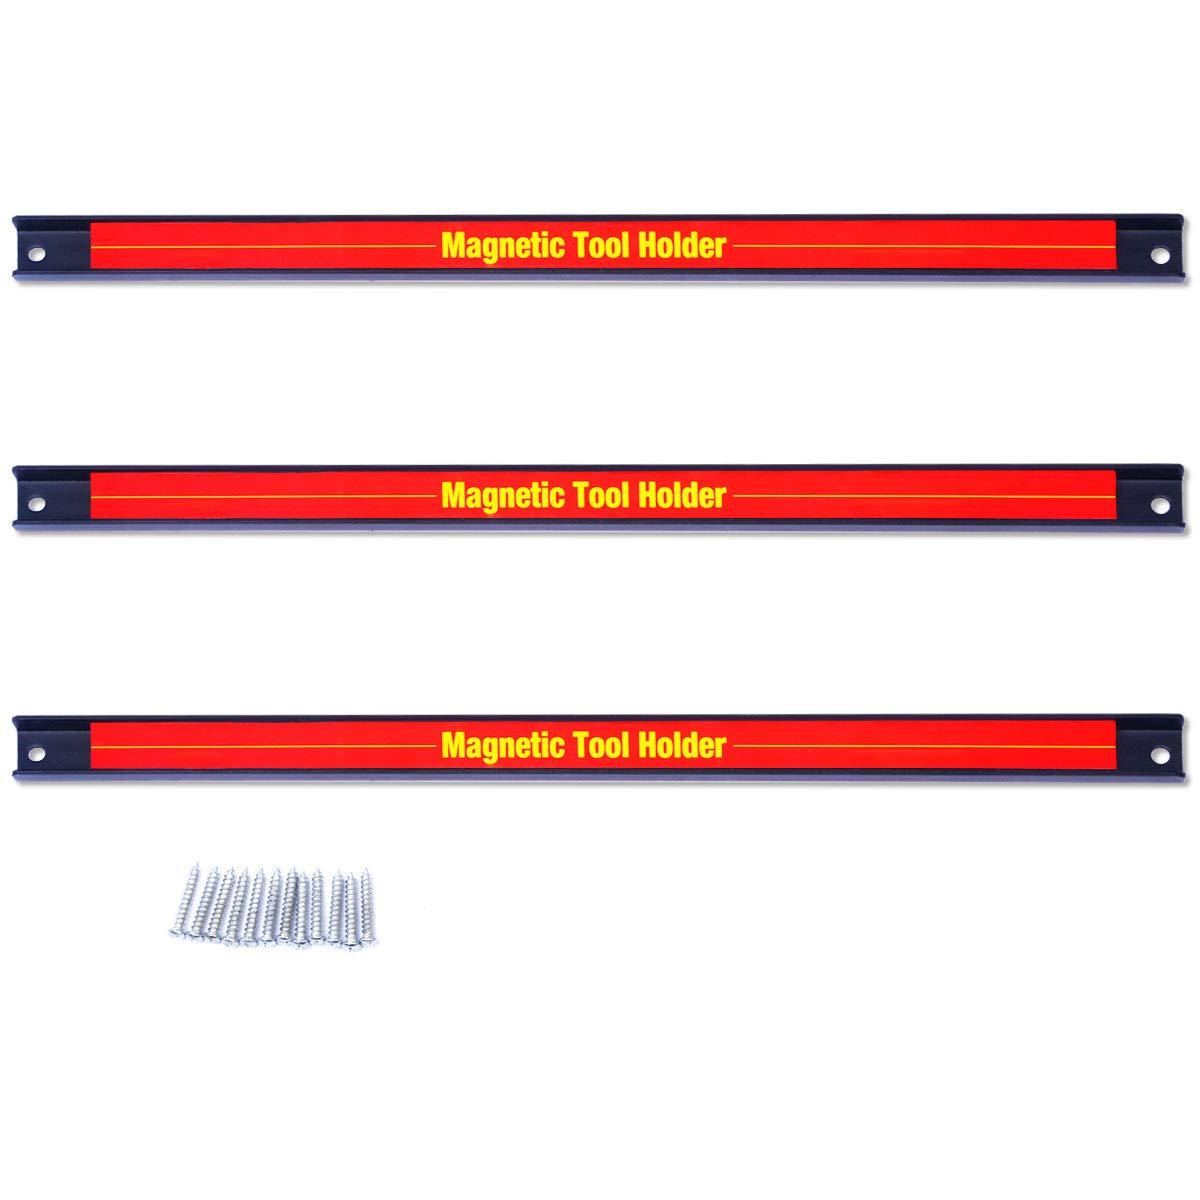 Goplus 3 PCS 18 Magnetic Tool Holder Bar Organizer Storage Rack Knife Wrench Pilers